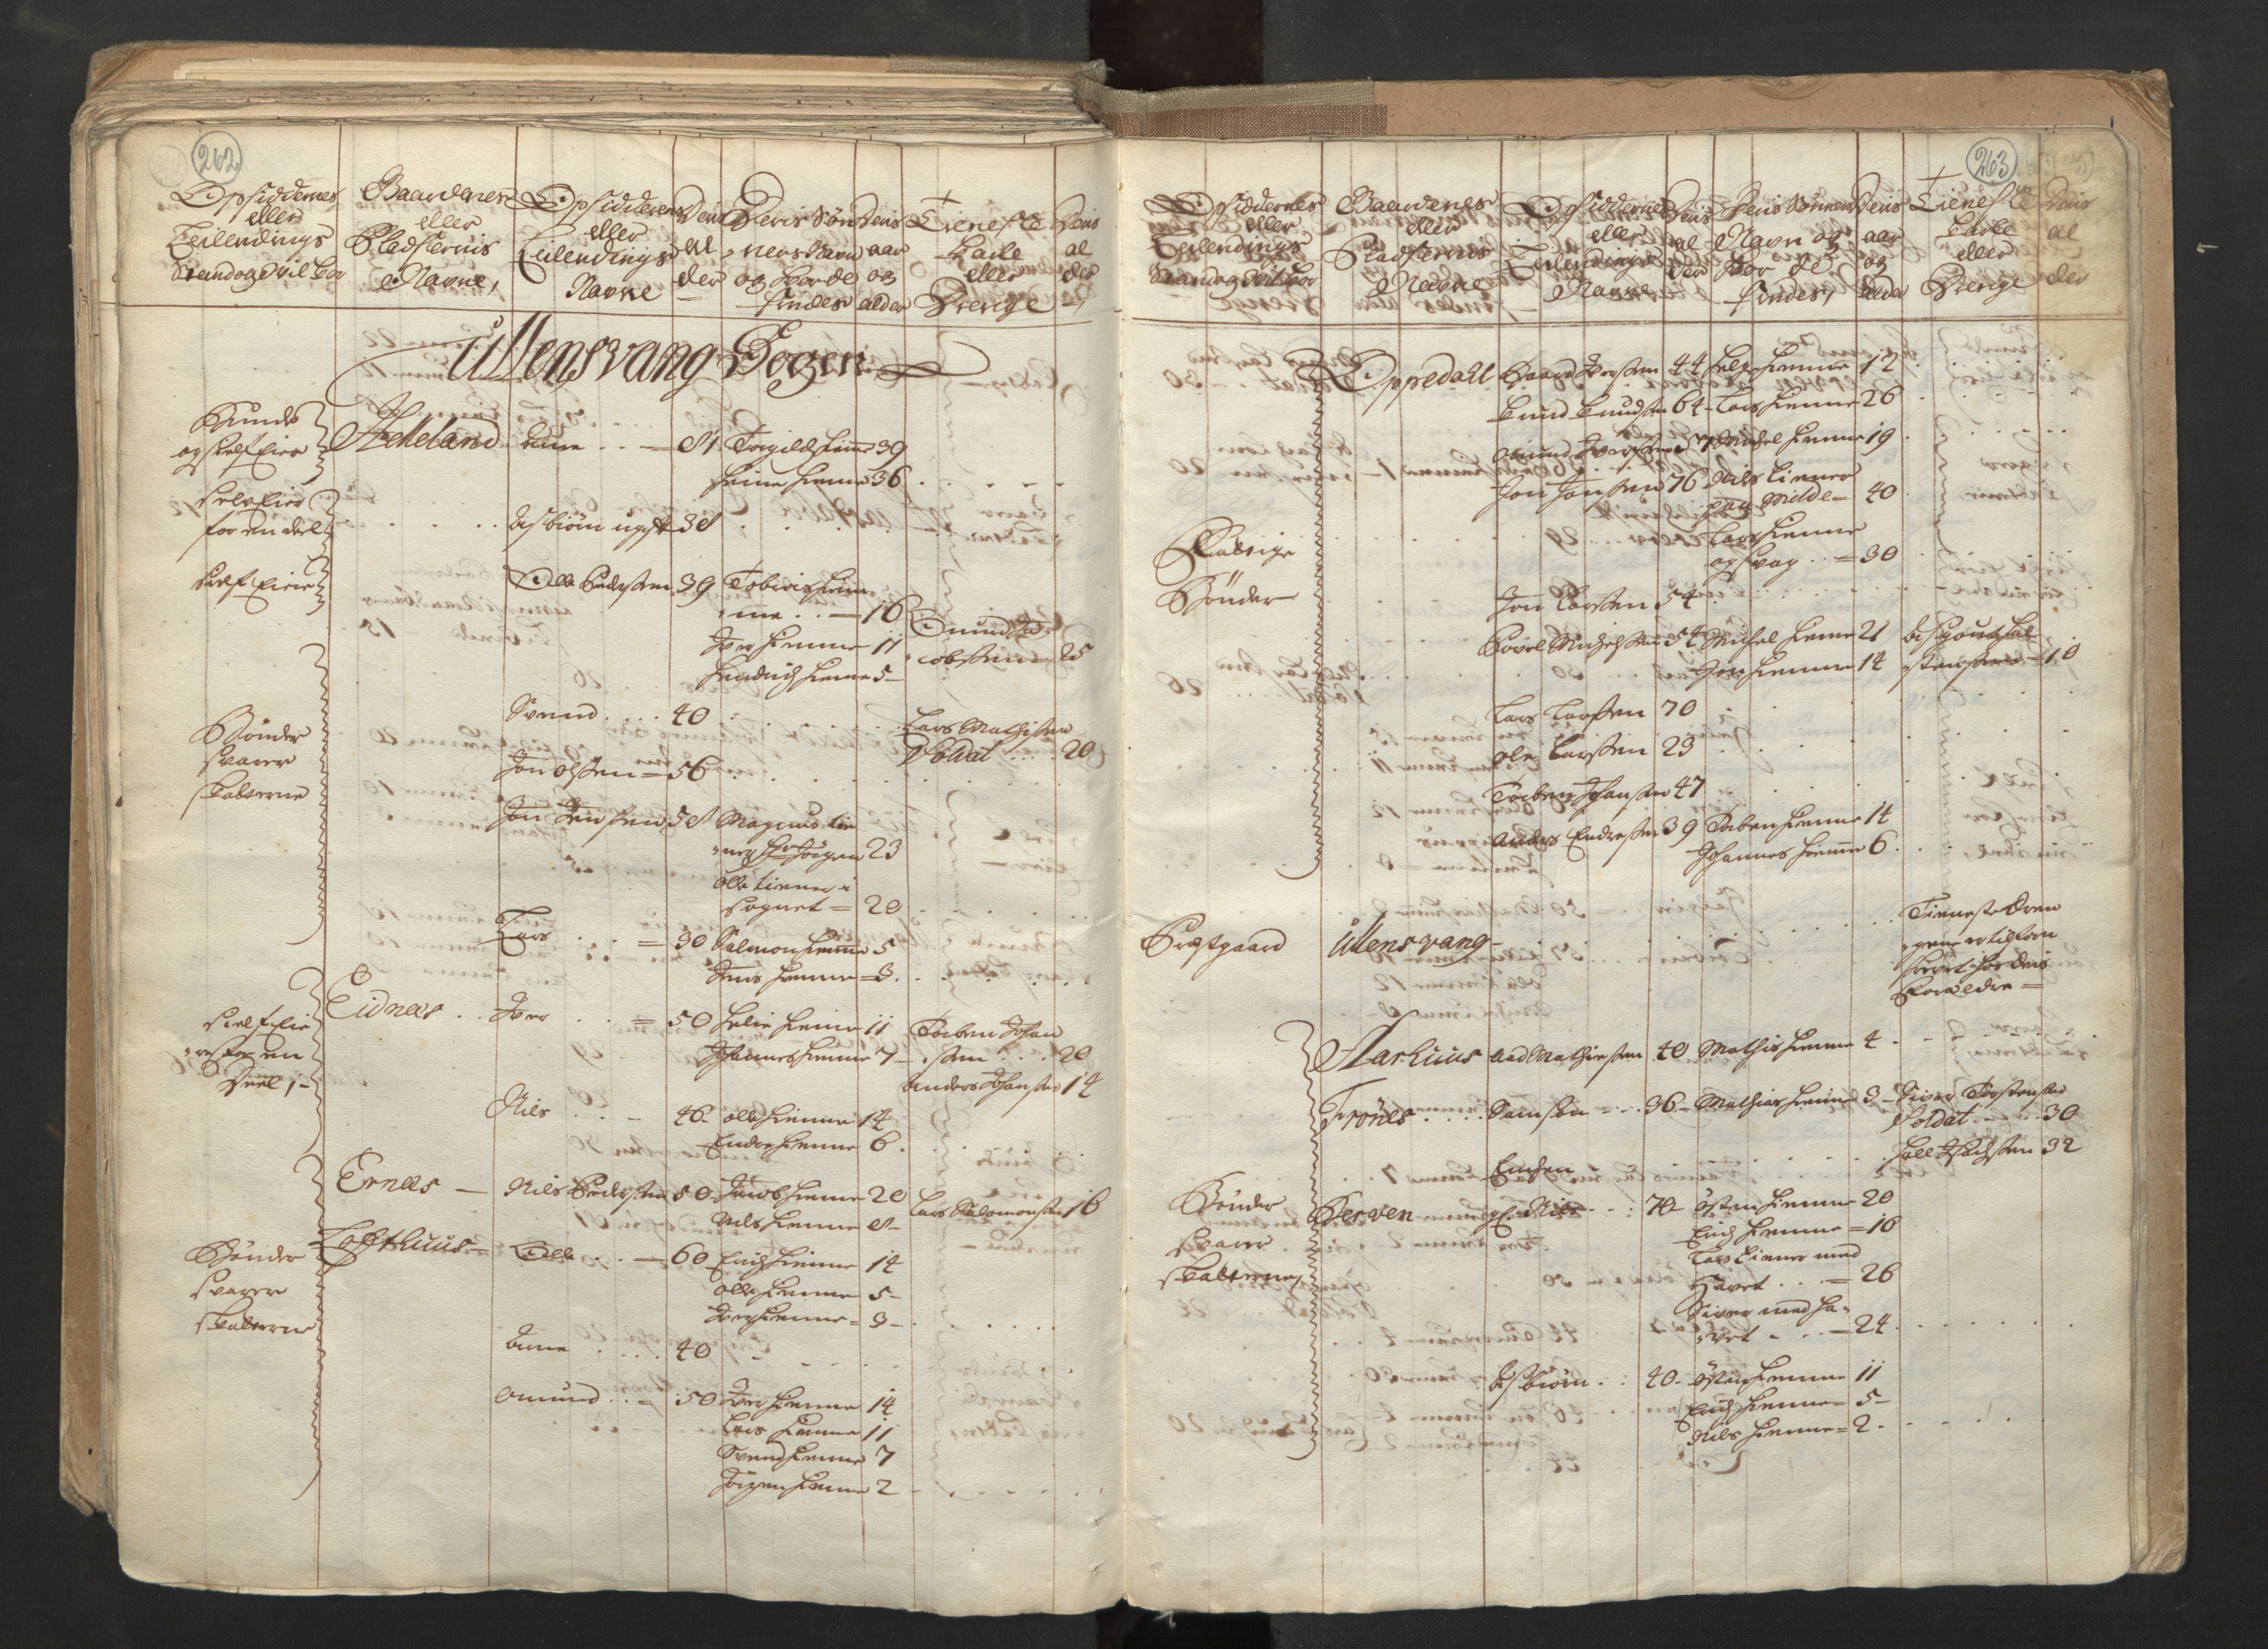 RA, Manntallet 1701, nr. 6: Sunnhordland fogderi og Hardanger fogderi, 1701, s. 262-263